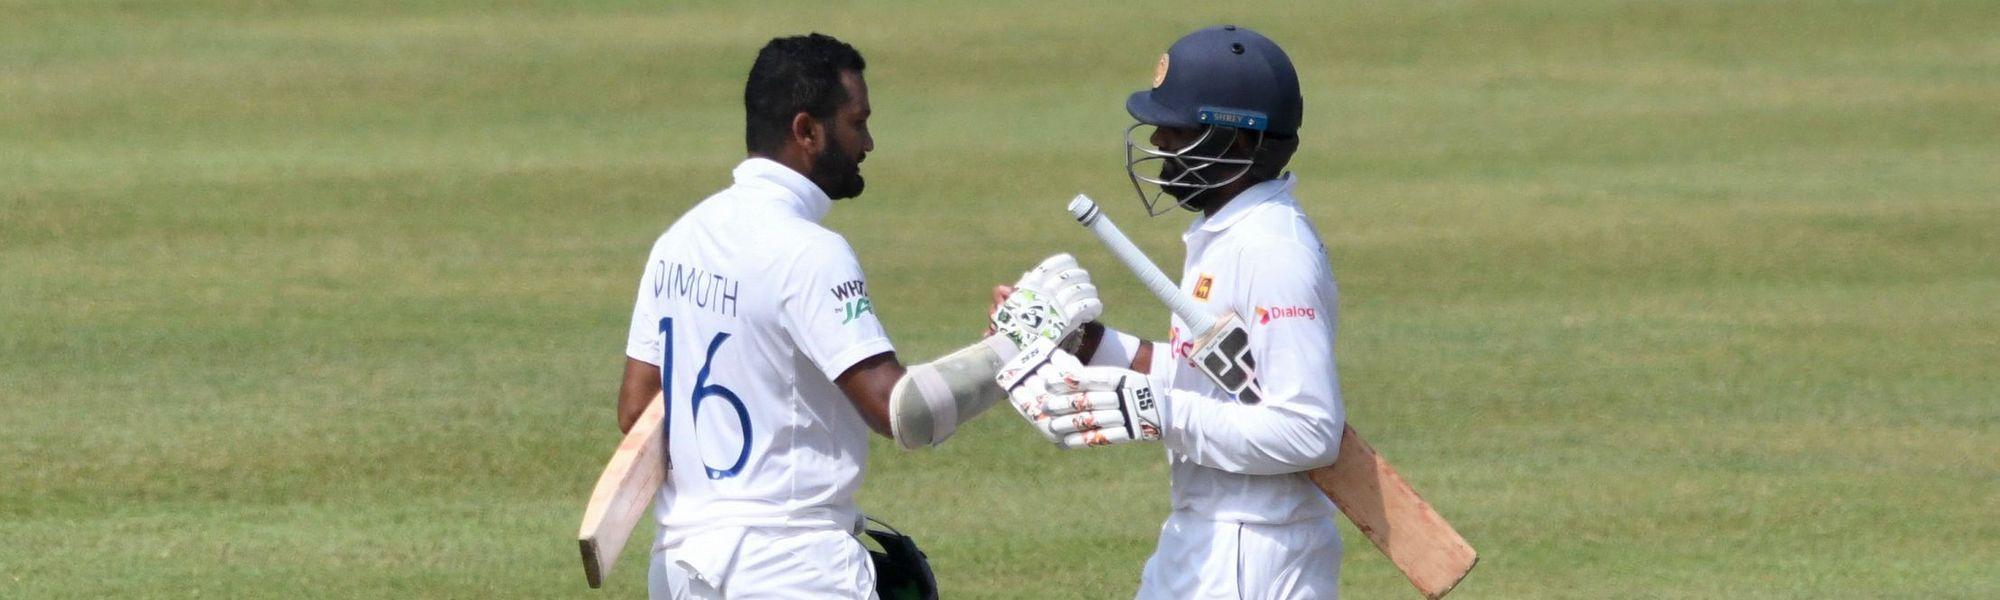 Sri Lanka openers v Ban